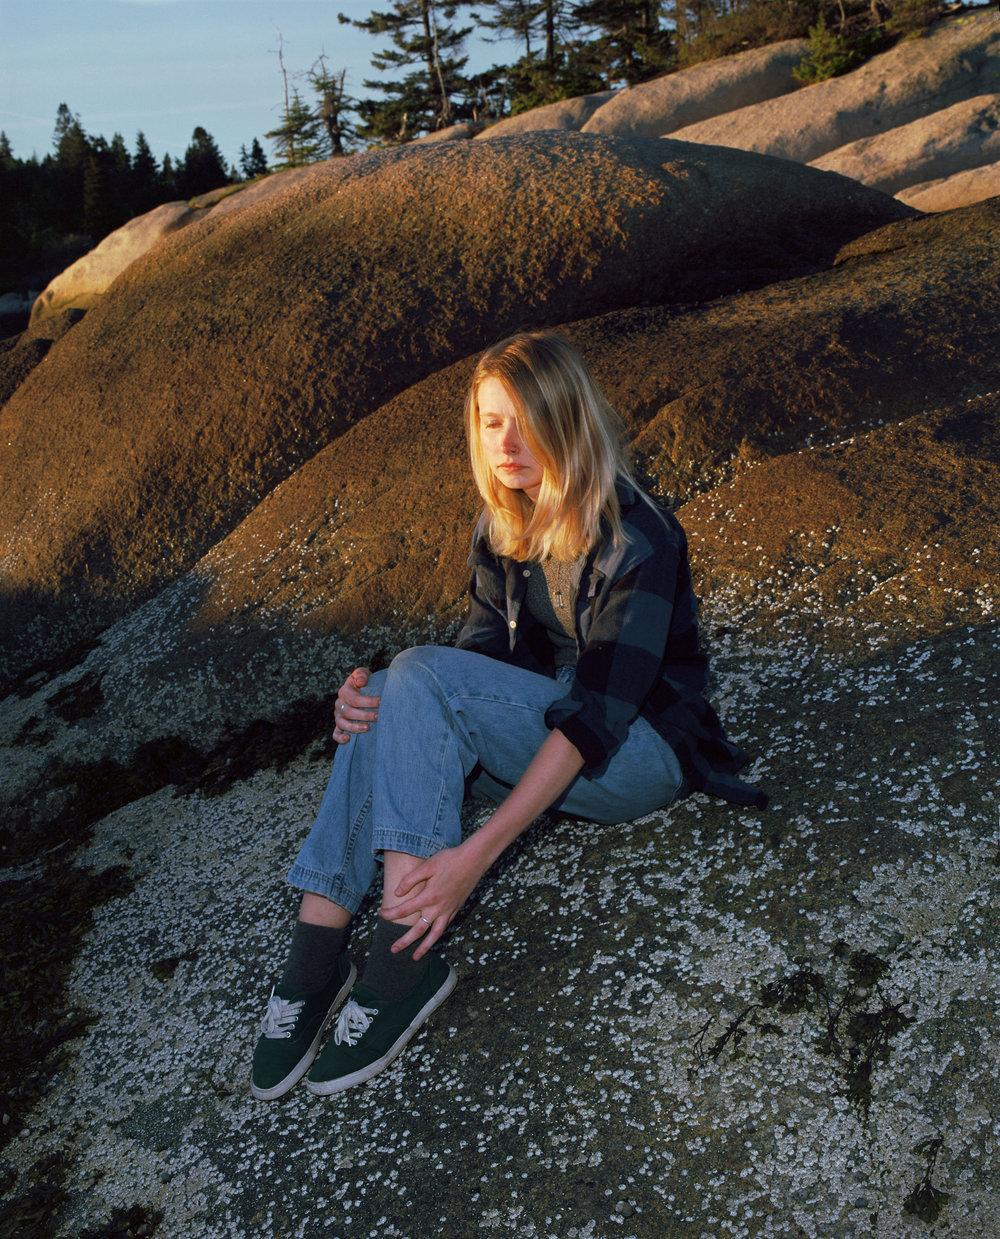 tabitha on the rocks.jpg